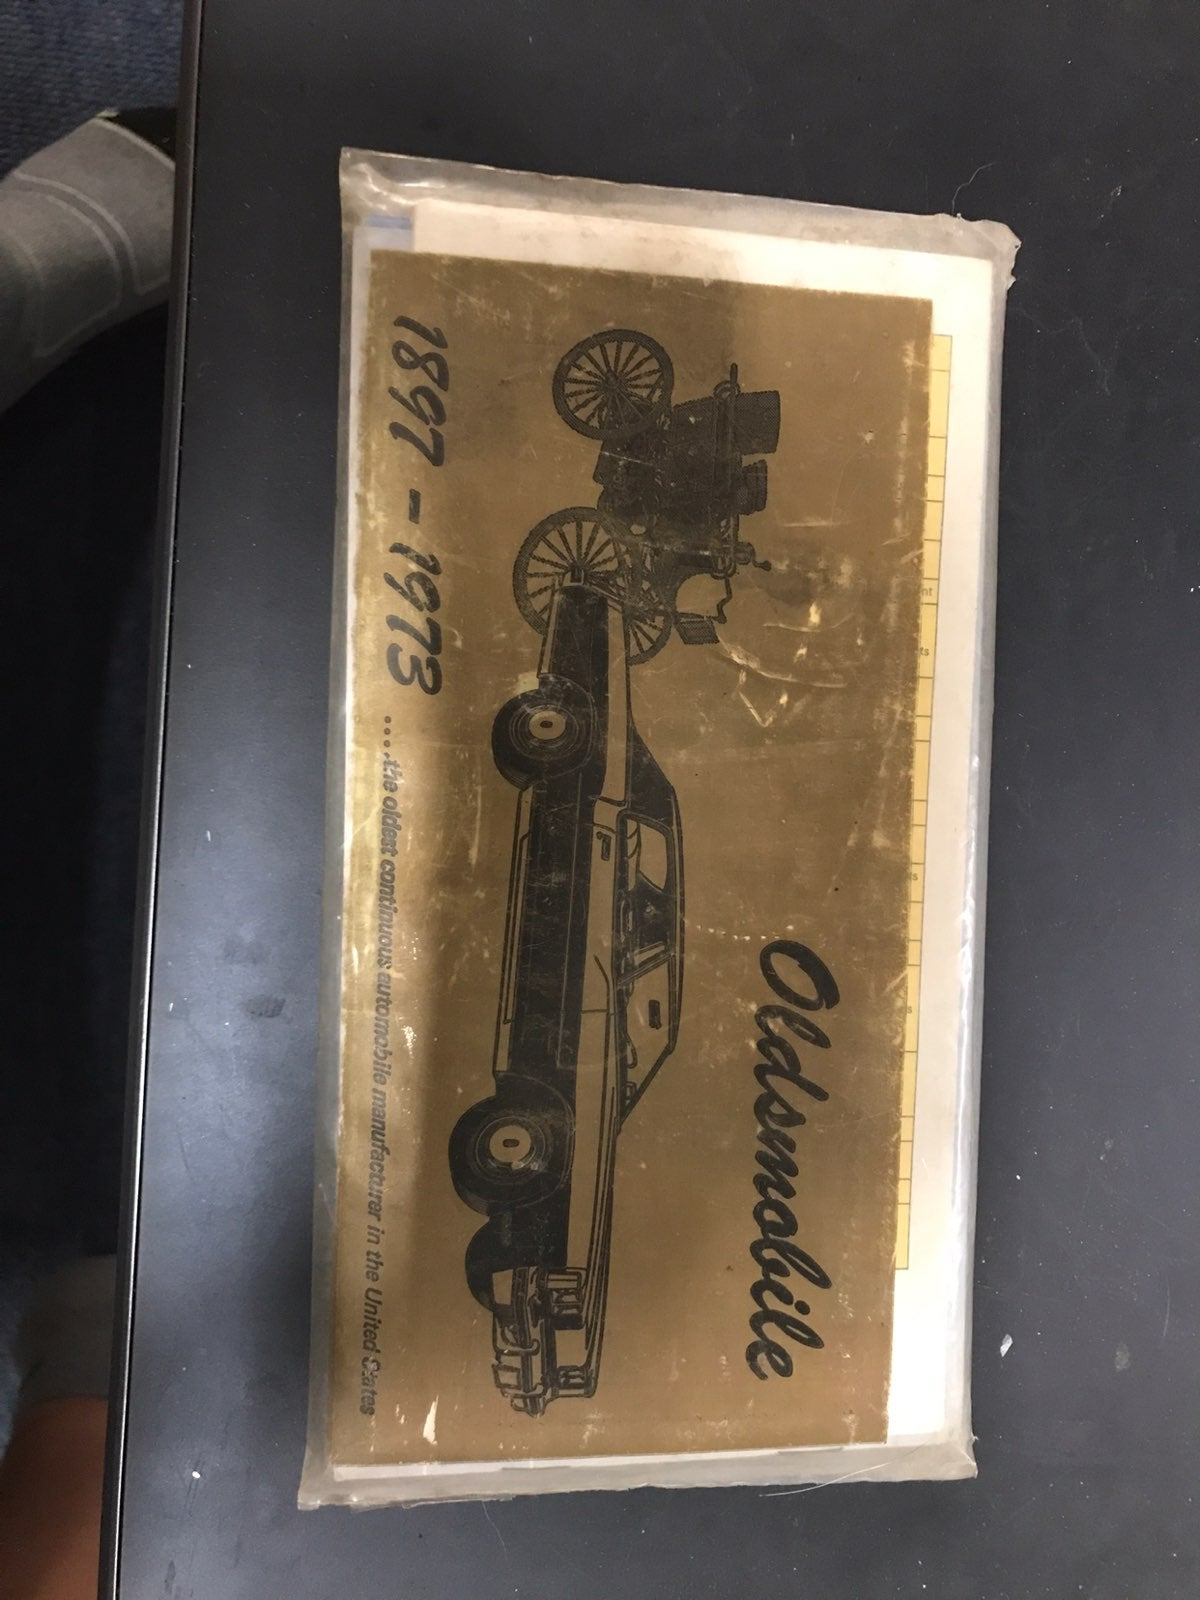 1973 Oldsmobile Glove Box Manuals